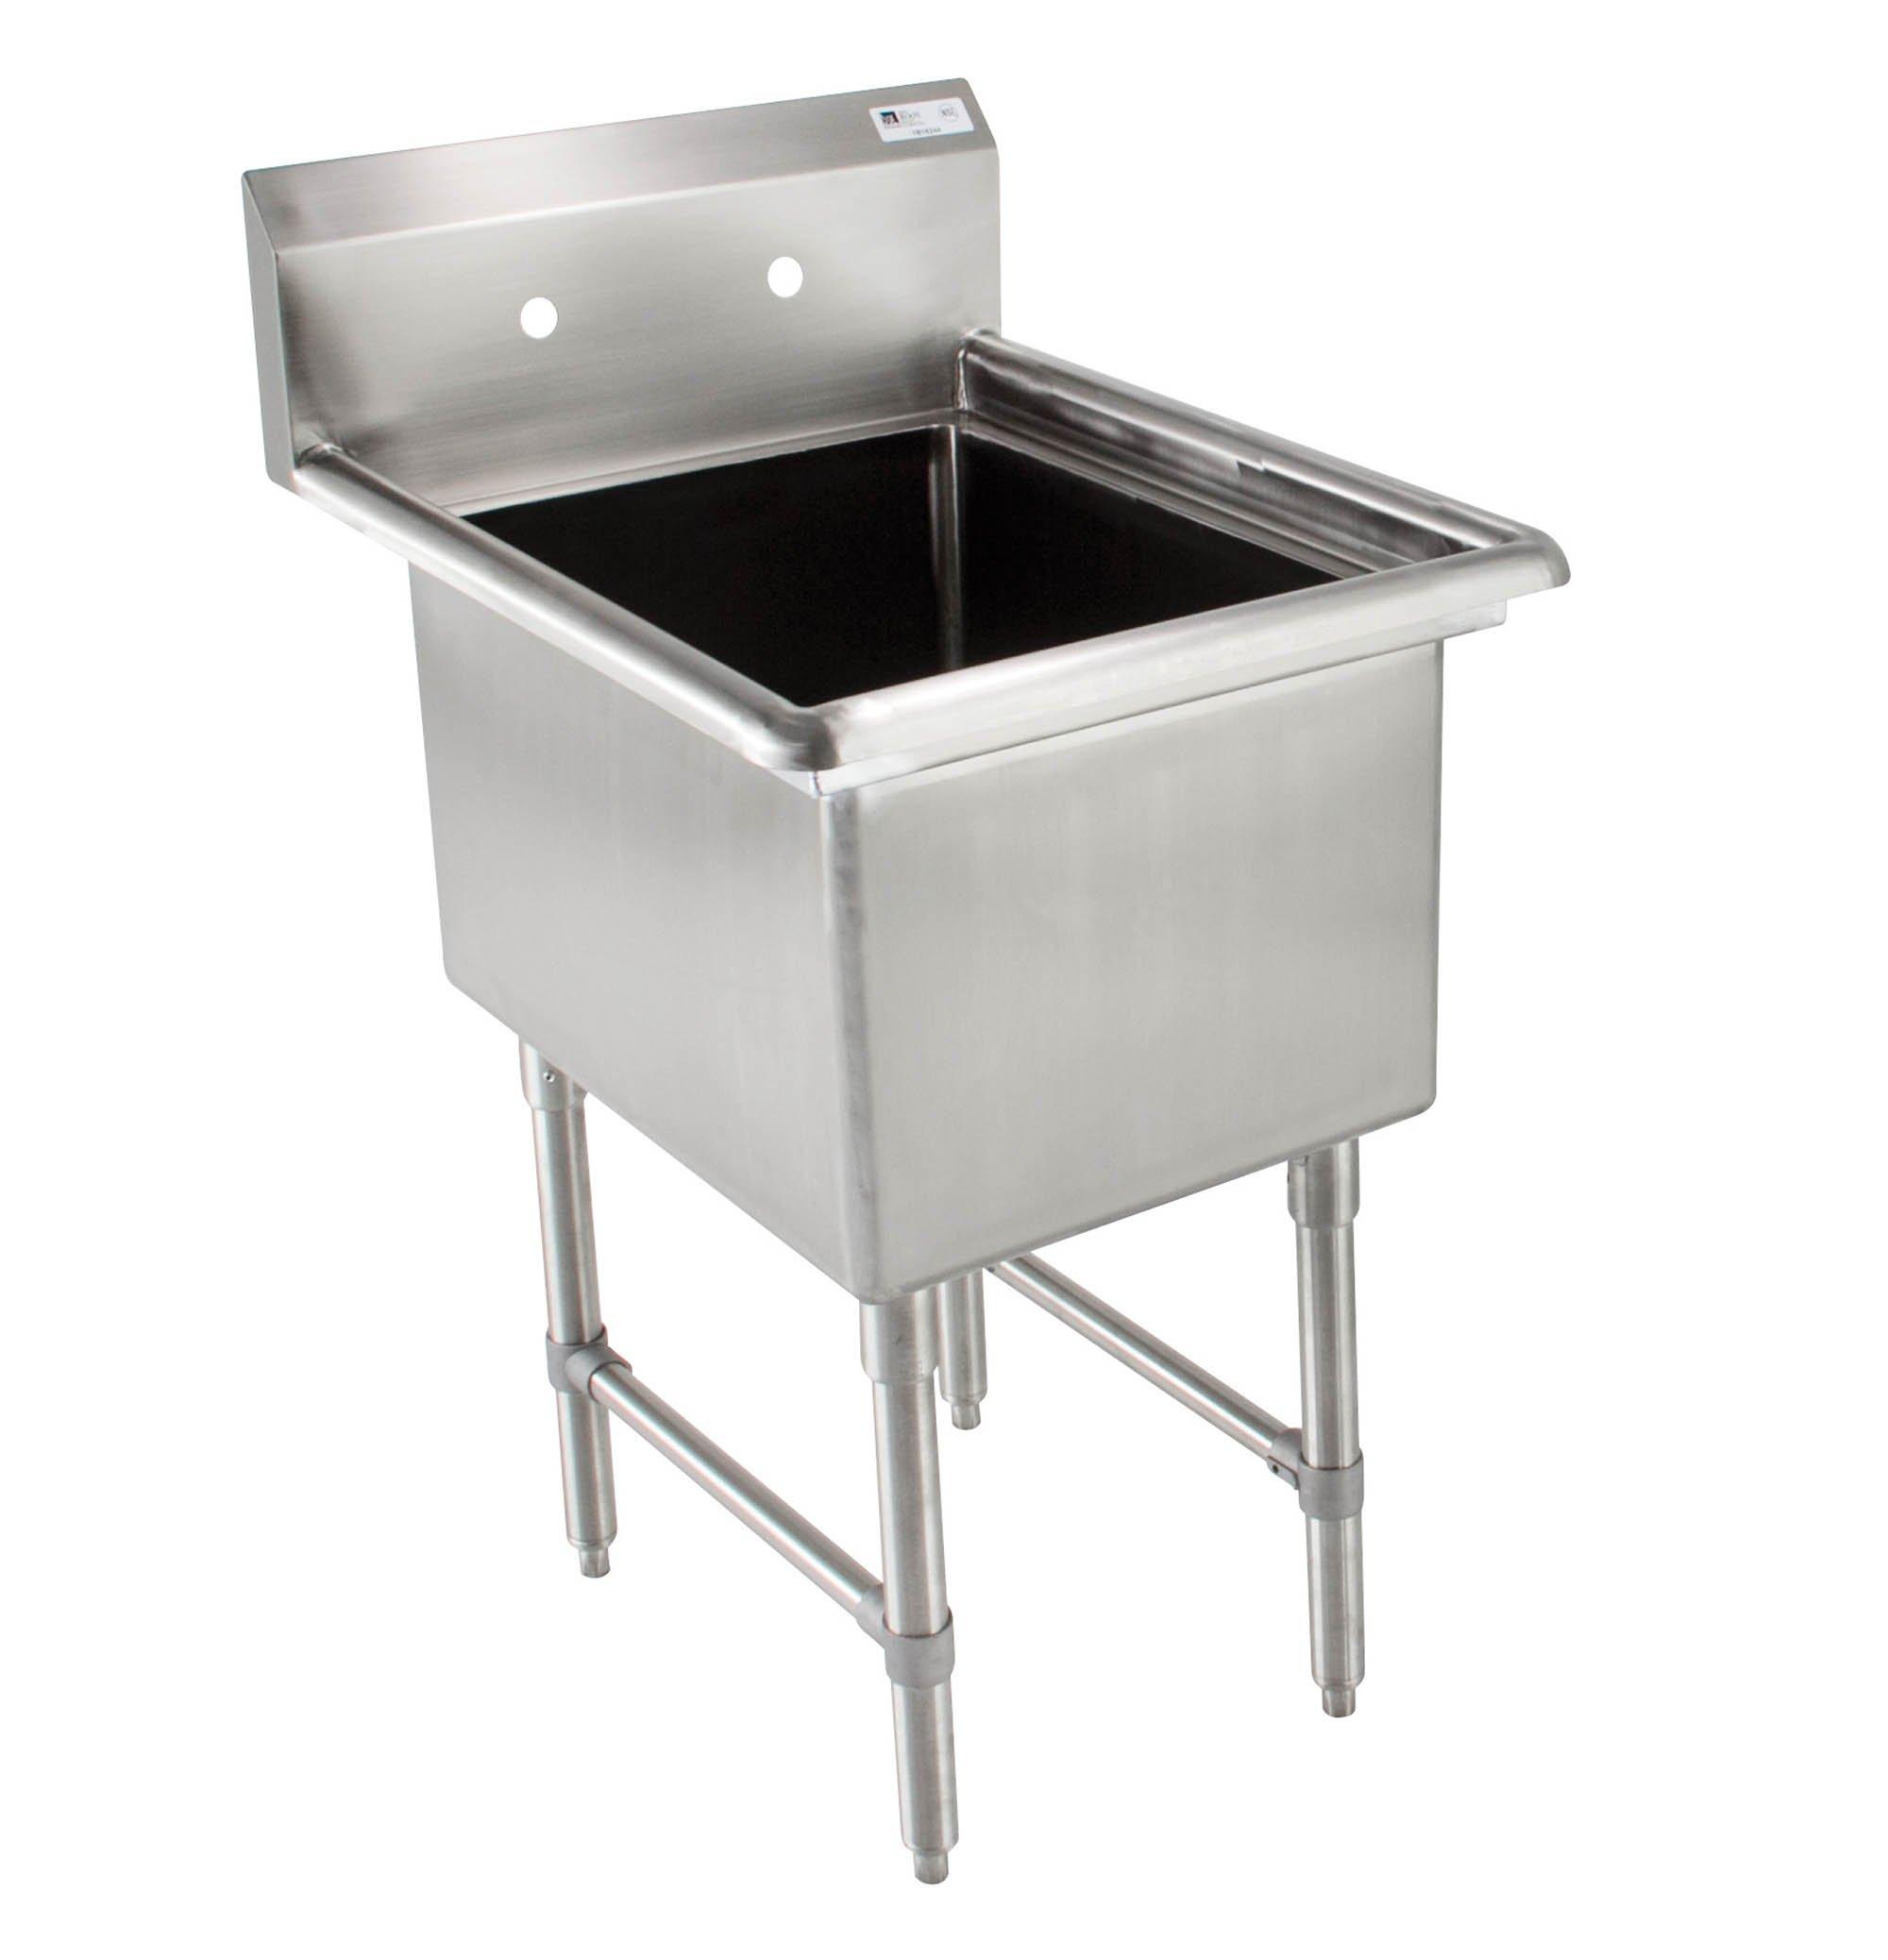 John Boos B Series Stainless Steel Sink, 14'' Deep Bowl, 1 Compartment, 21'' Length x 25-1/2'' Width